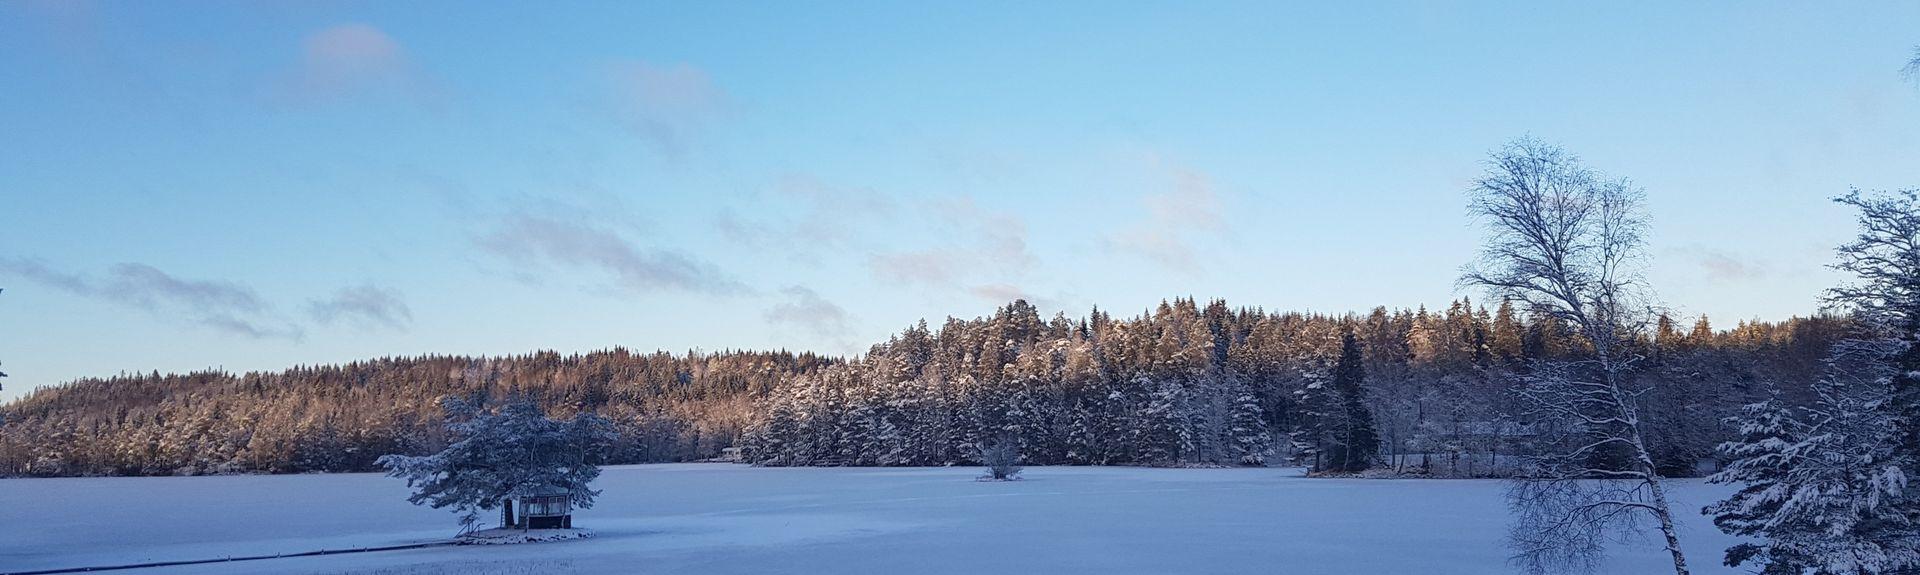 Örebro County, Sweden